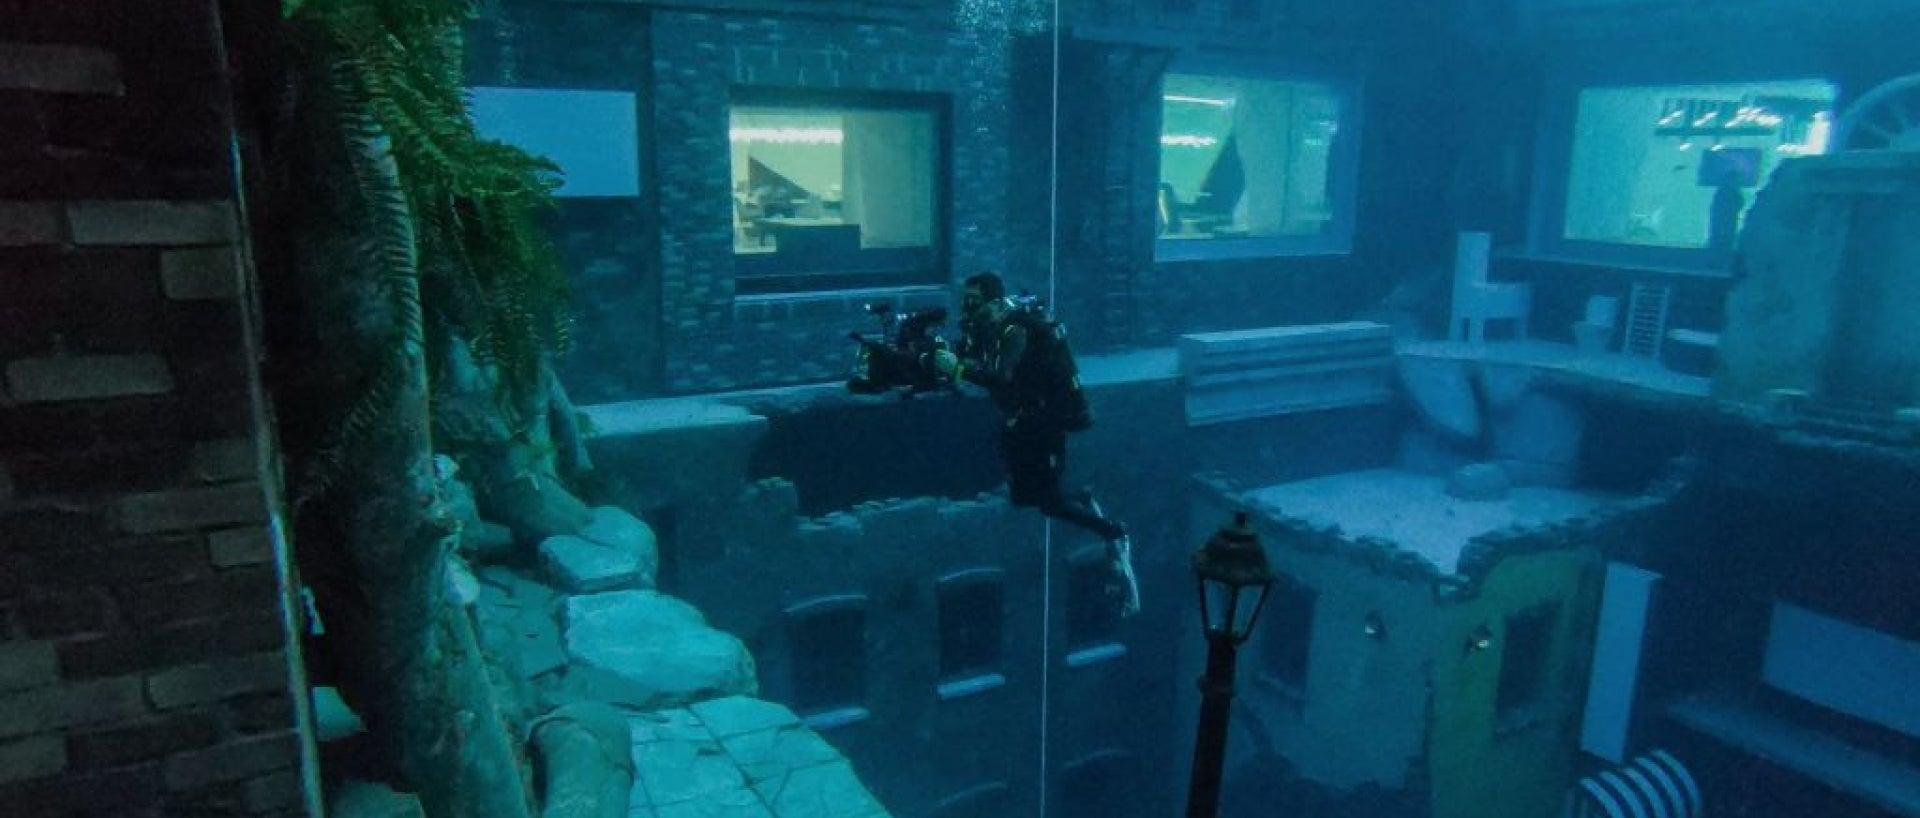 Deep Dive Dubai diver enjoying pool